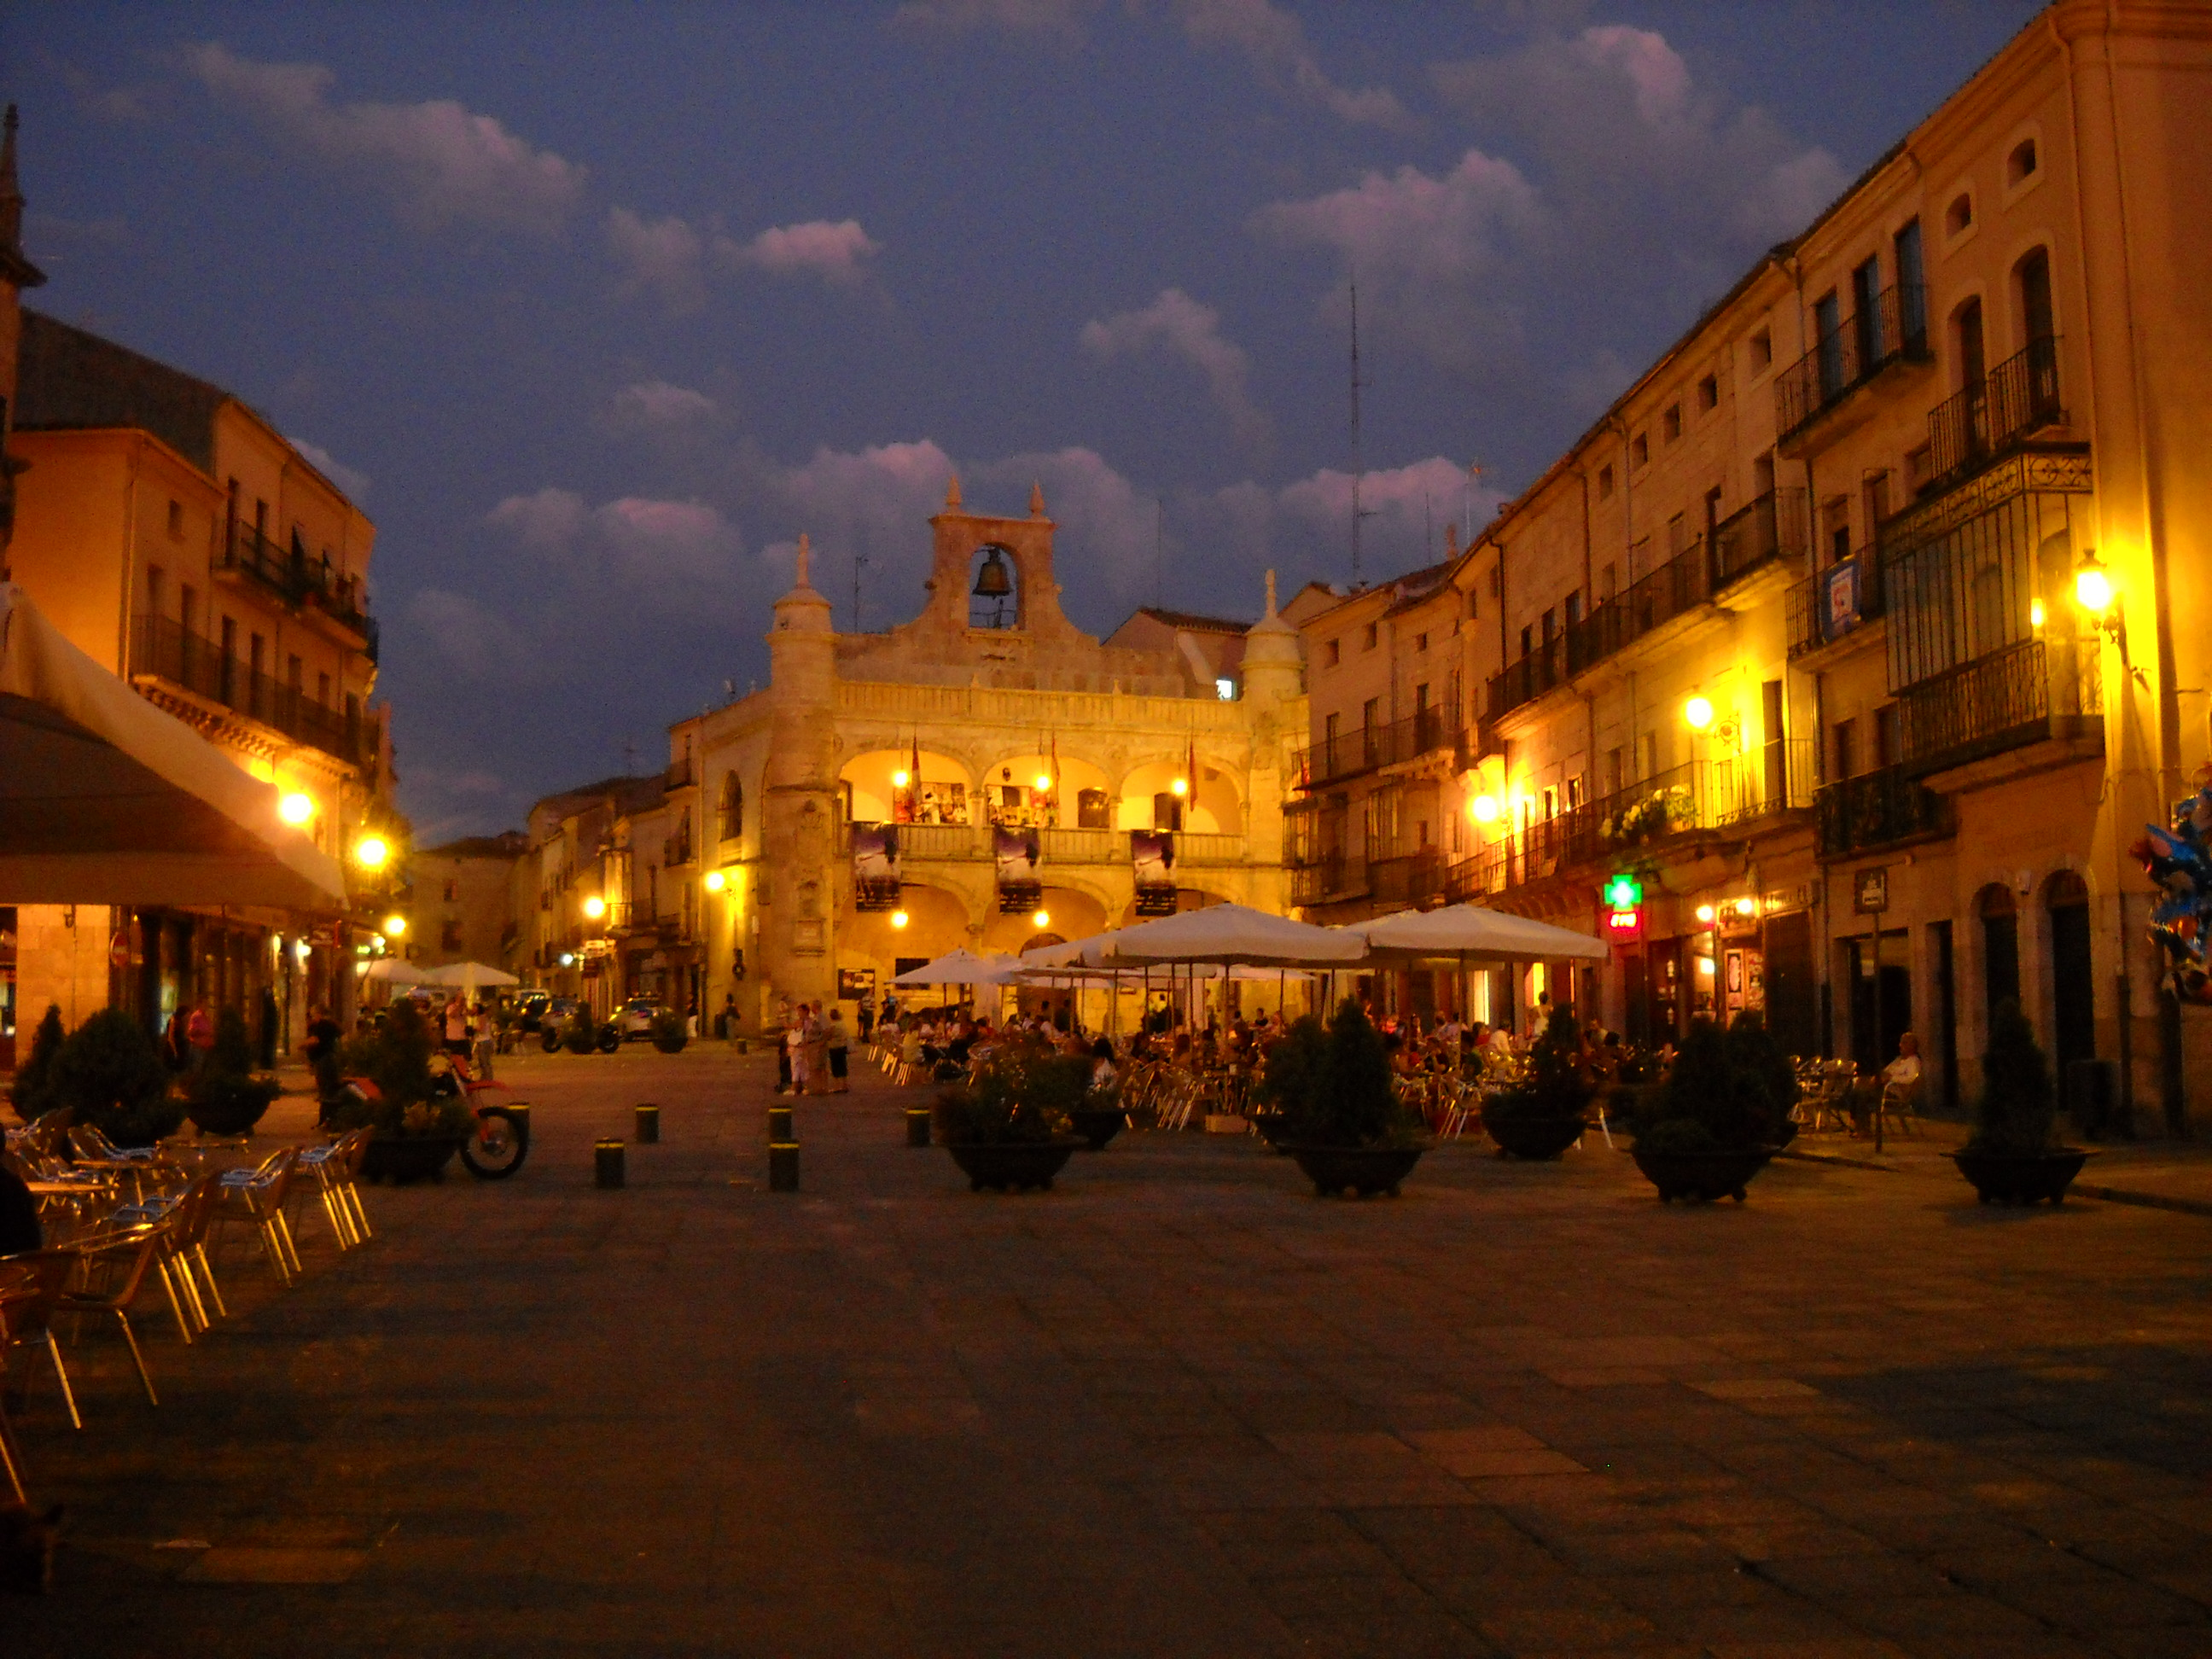 http://upload.wikimedia.org/wikipedia/commons/7/7b/LiB_plaza_mayor_ciudad_rodrigo_01.jpg